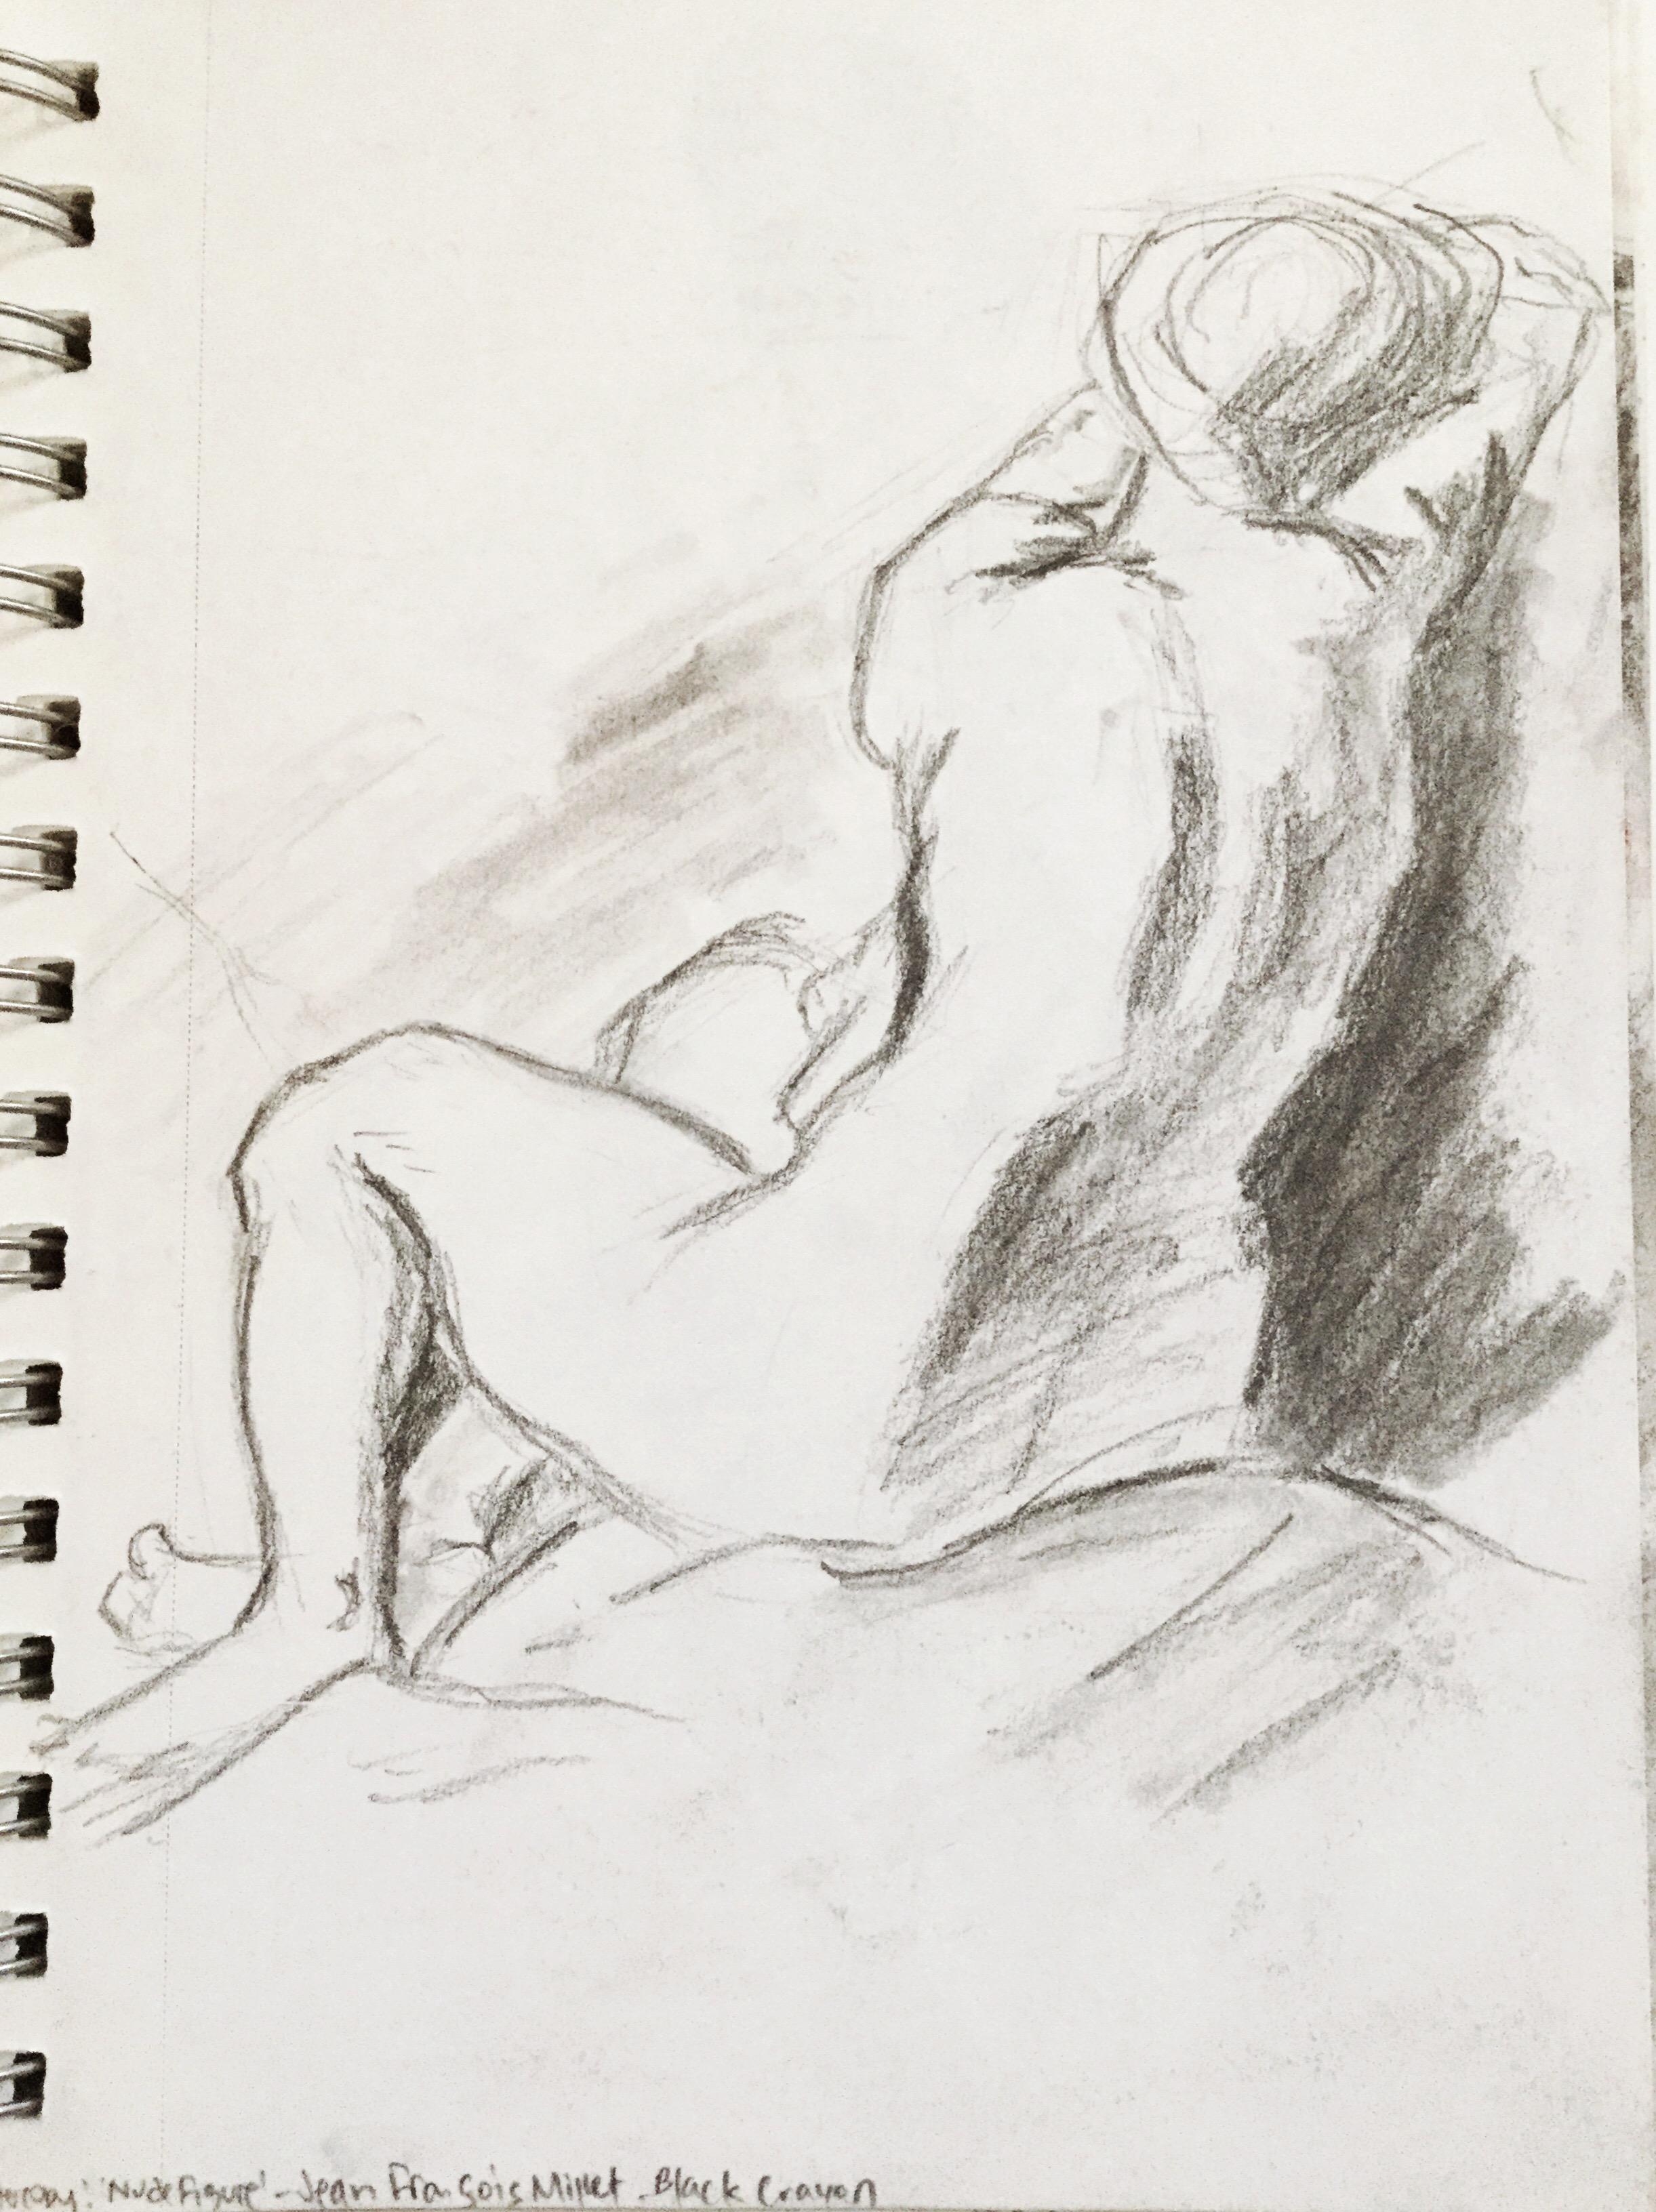 Master Copy of Jean Francois Millet's Nude Figure